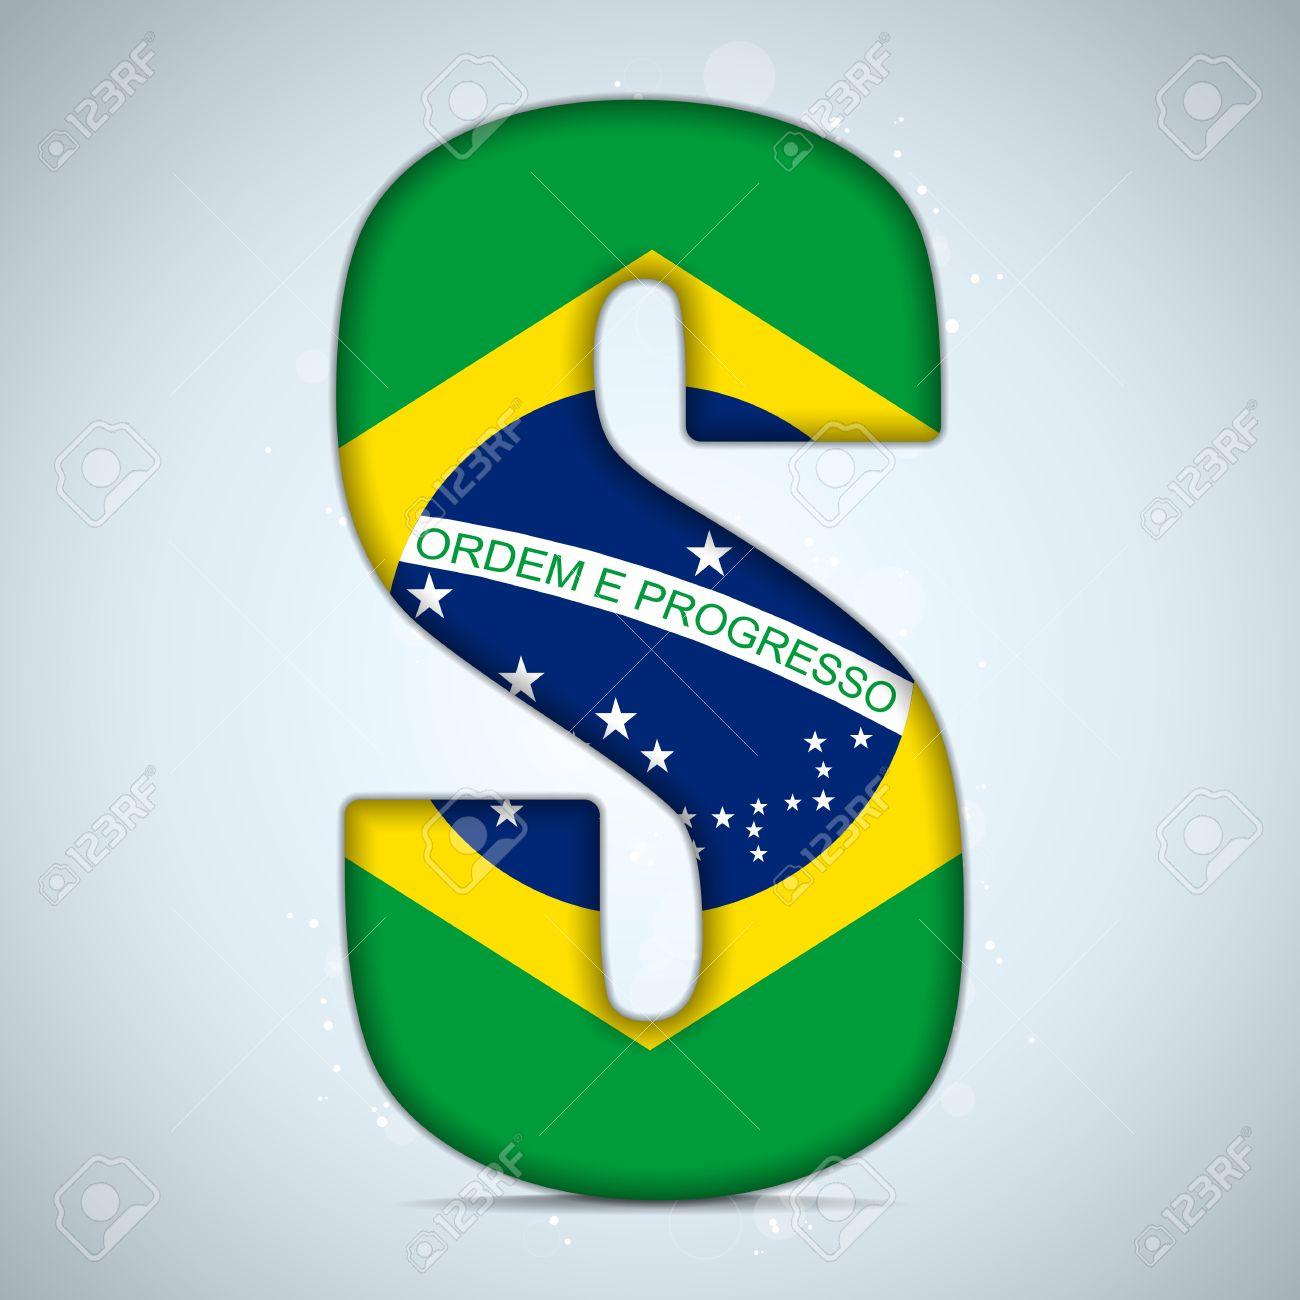 Flag alphabet letters clipart black and white stock Brazil Flag Brazilian Alphabet Letters Words Royalty Free Cliparts ... black and white stock